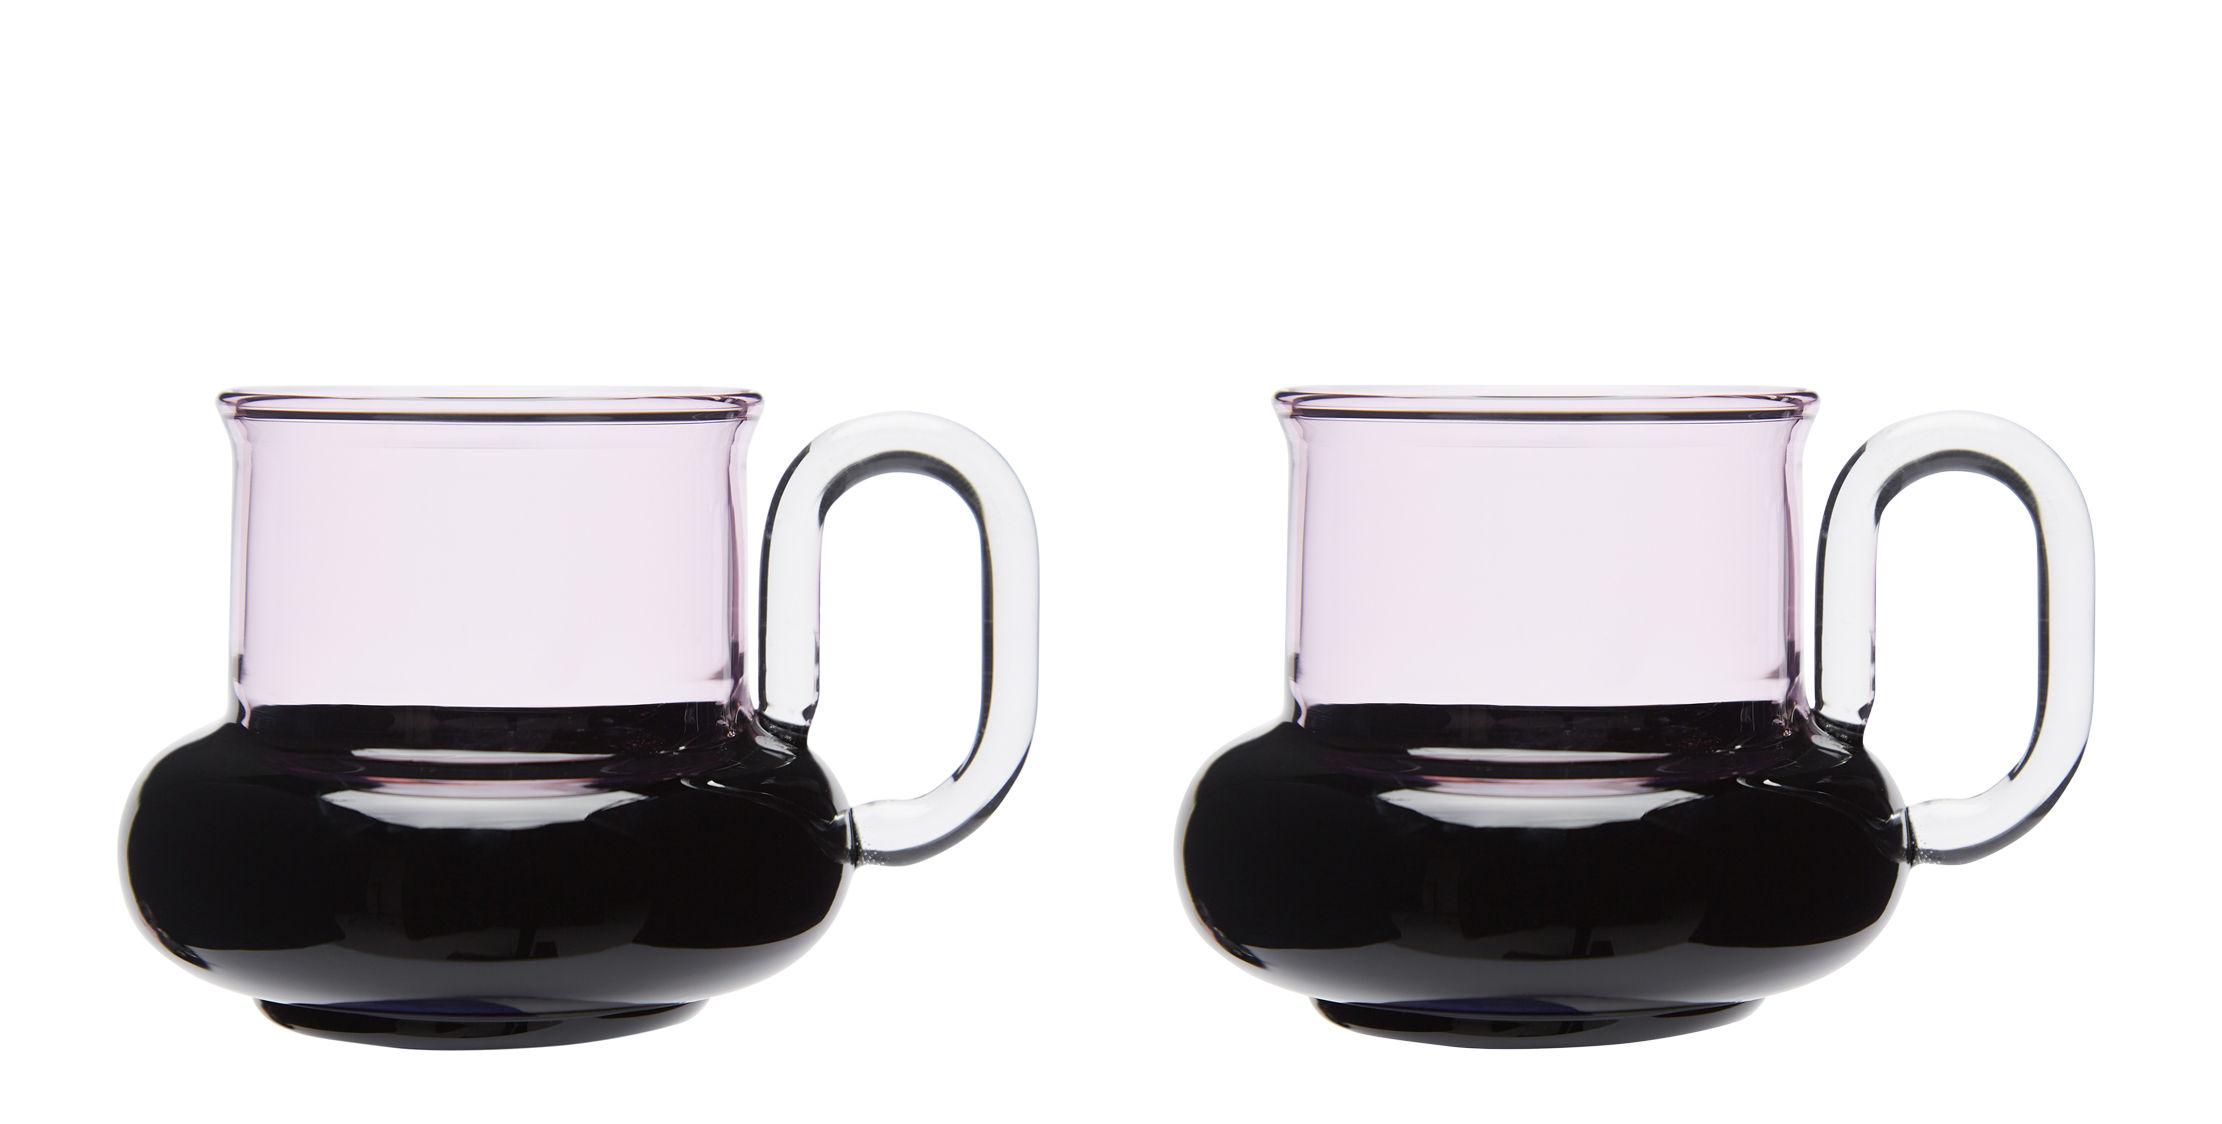 Tischkultur - Tassen und Becher - Bump Teetasse / 2er-Set - mundgeblasenes Glas - Tom Dixon - Rosa & schwarz - Verre borosilicate soufflé